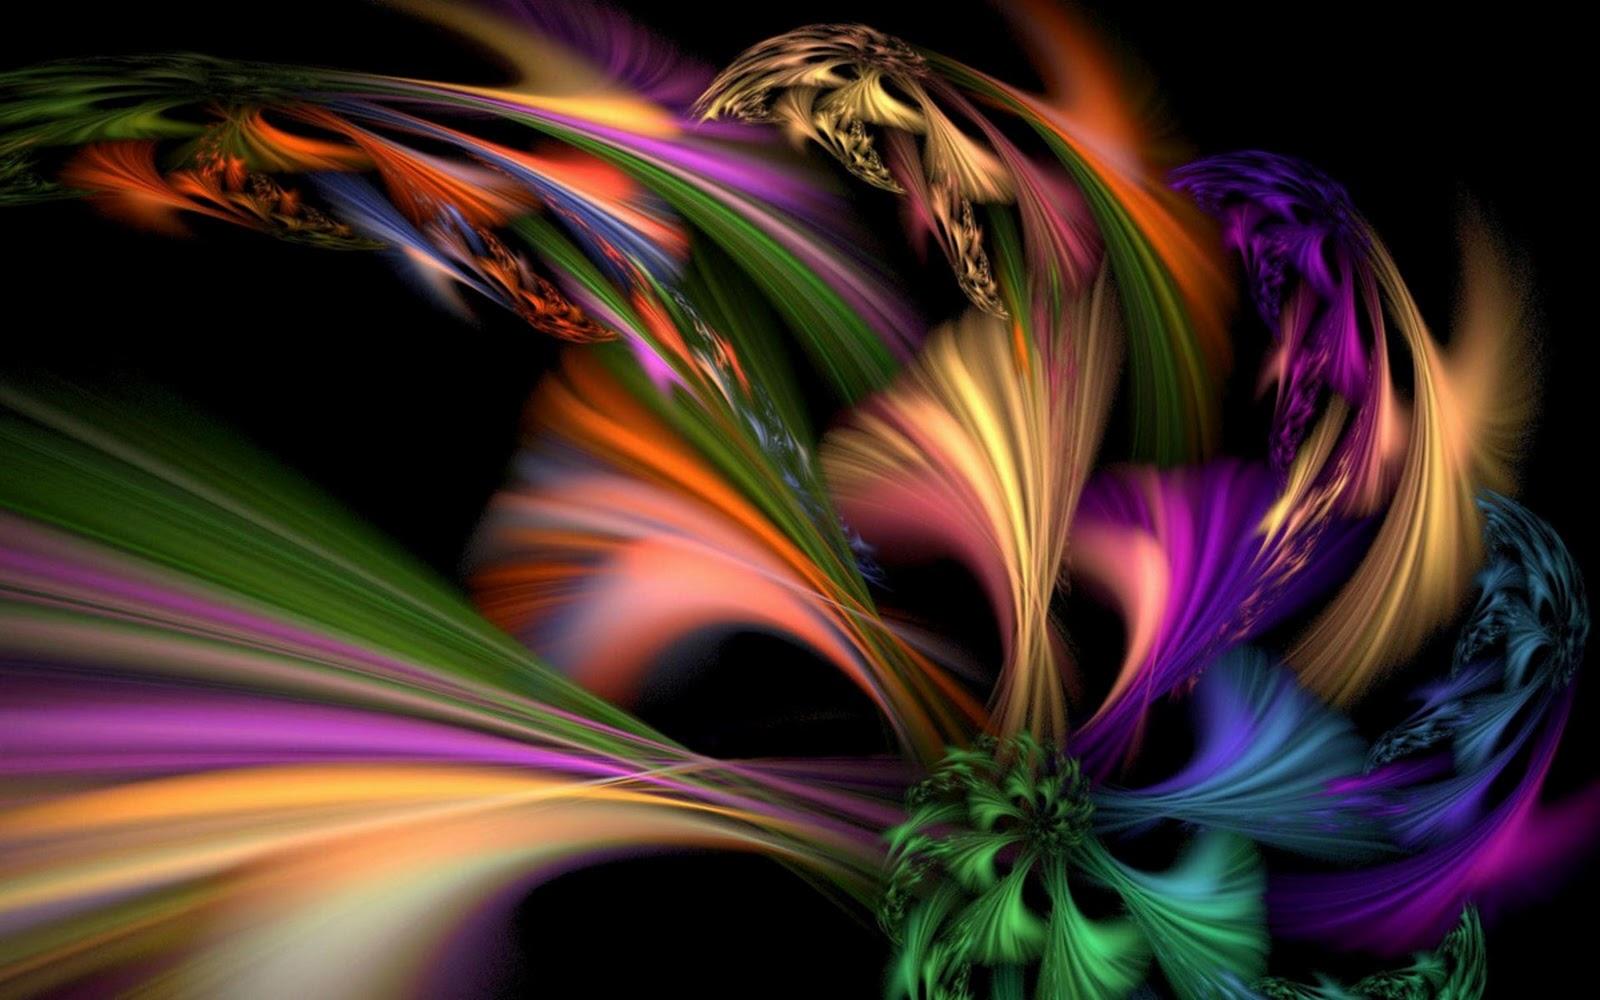 http://1.bp.blogspot.com/-U7EJM37HPcs/TWaWd_vVVTI/AAAAAAAABJk/p3_cs_3kVOk/s1600/Colors_Outburst_hd_wallpaper.jpg